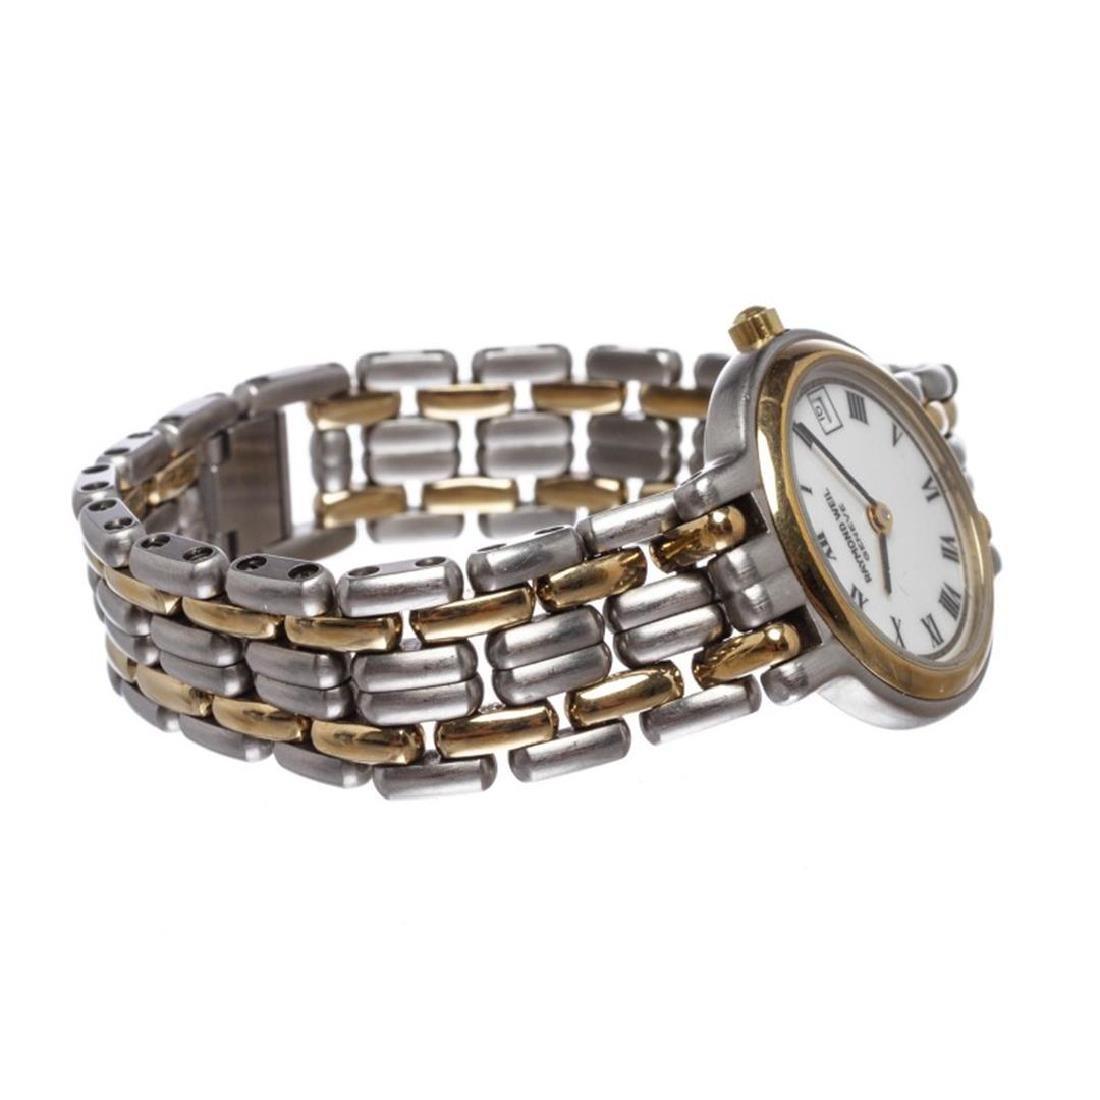 Raymond Weil Geneve Quartz Stainless Steel Wristwatch - 2